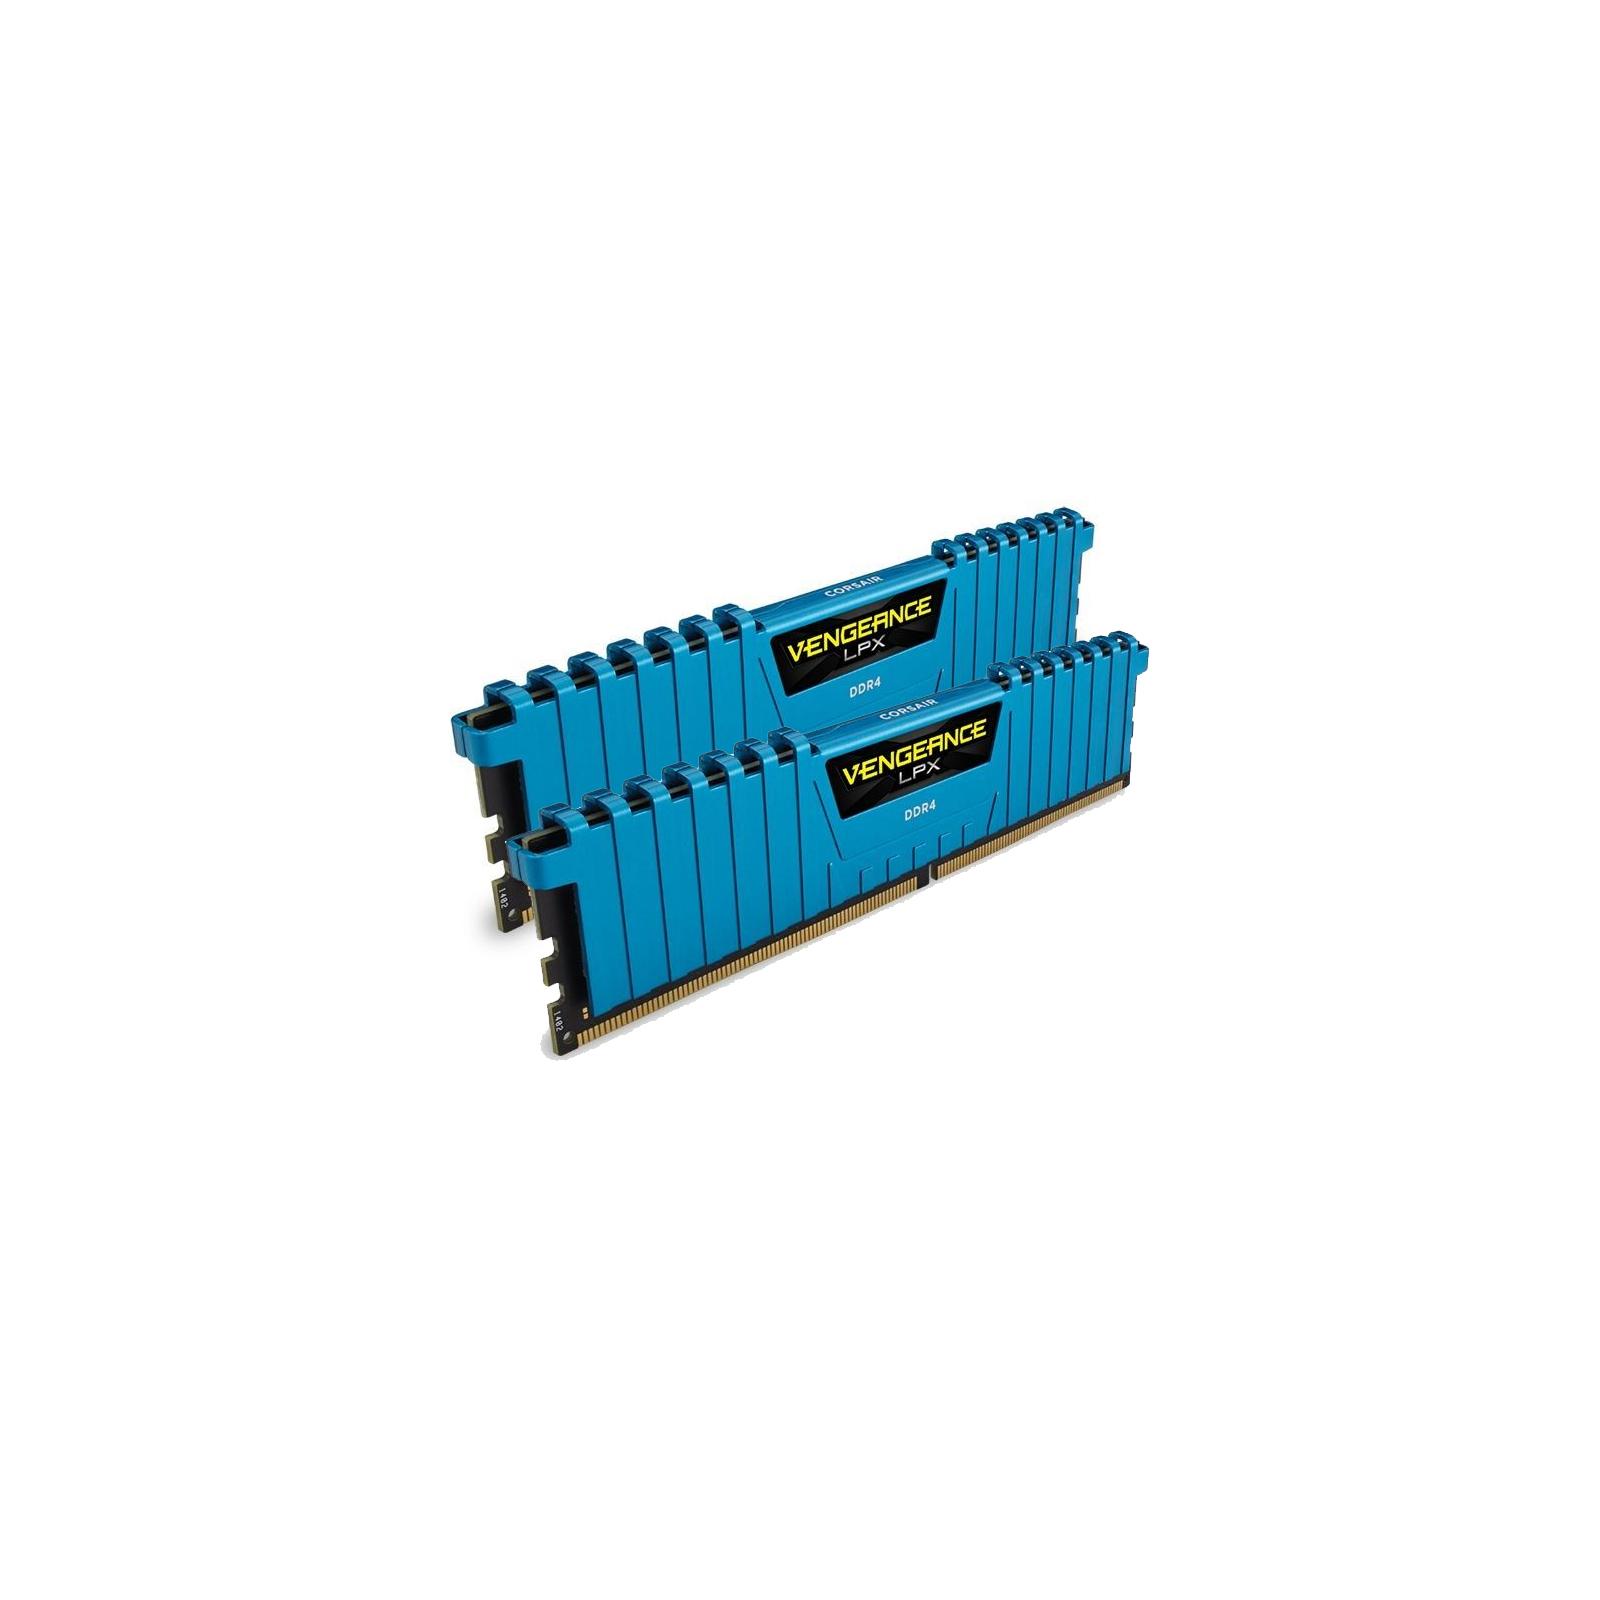 Модуль памяти для компьютера DDR4 16GB (2x8GB) 3000 MHz Vengeance LPX Blue Corsair (CMK16GX4M2B3000C15B) изображение 4